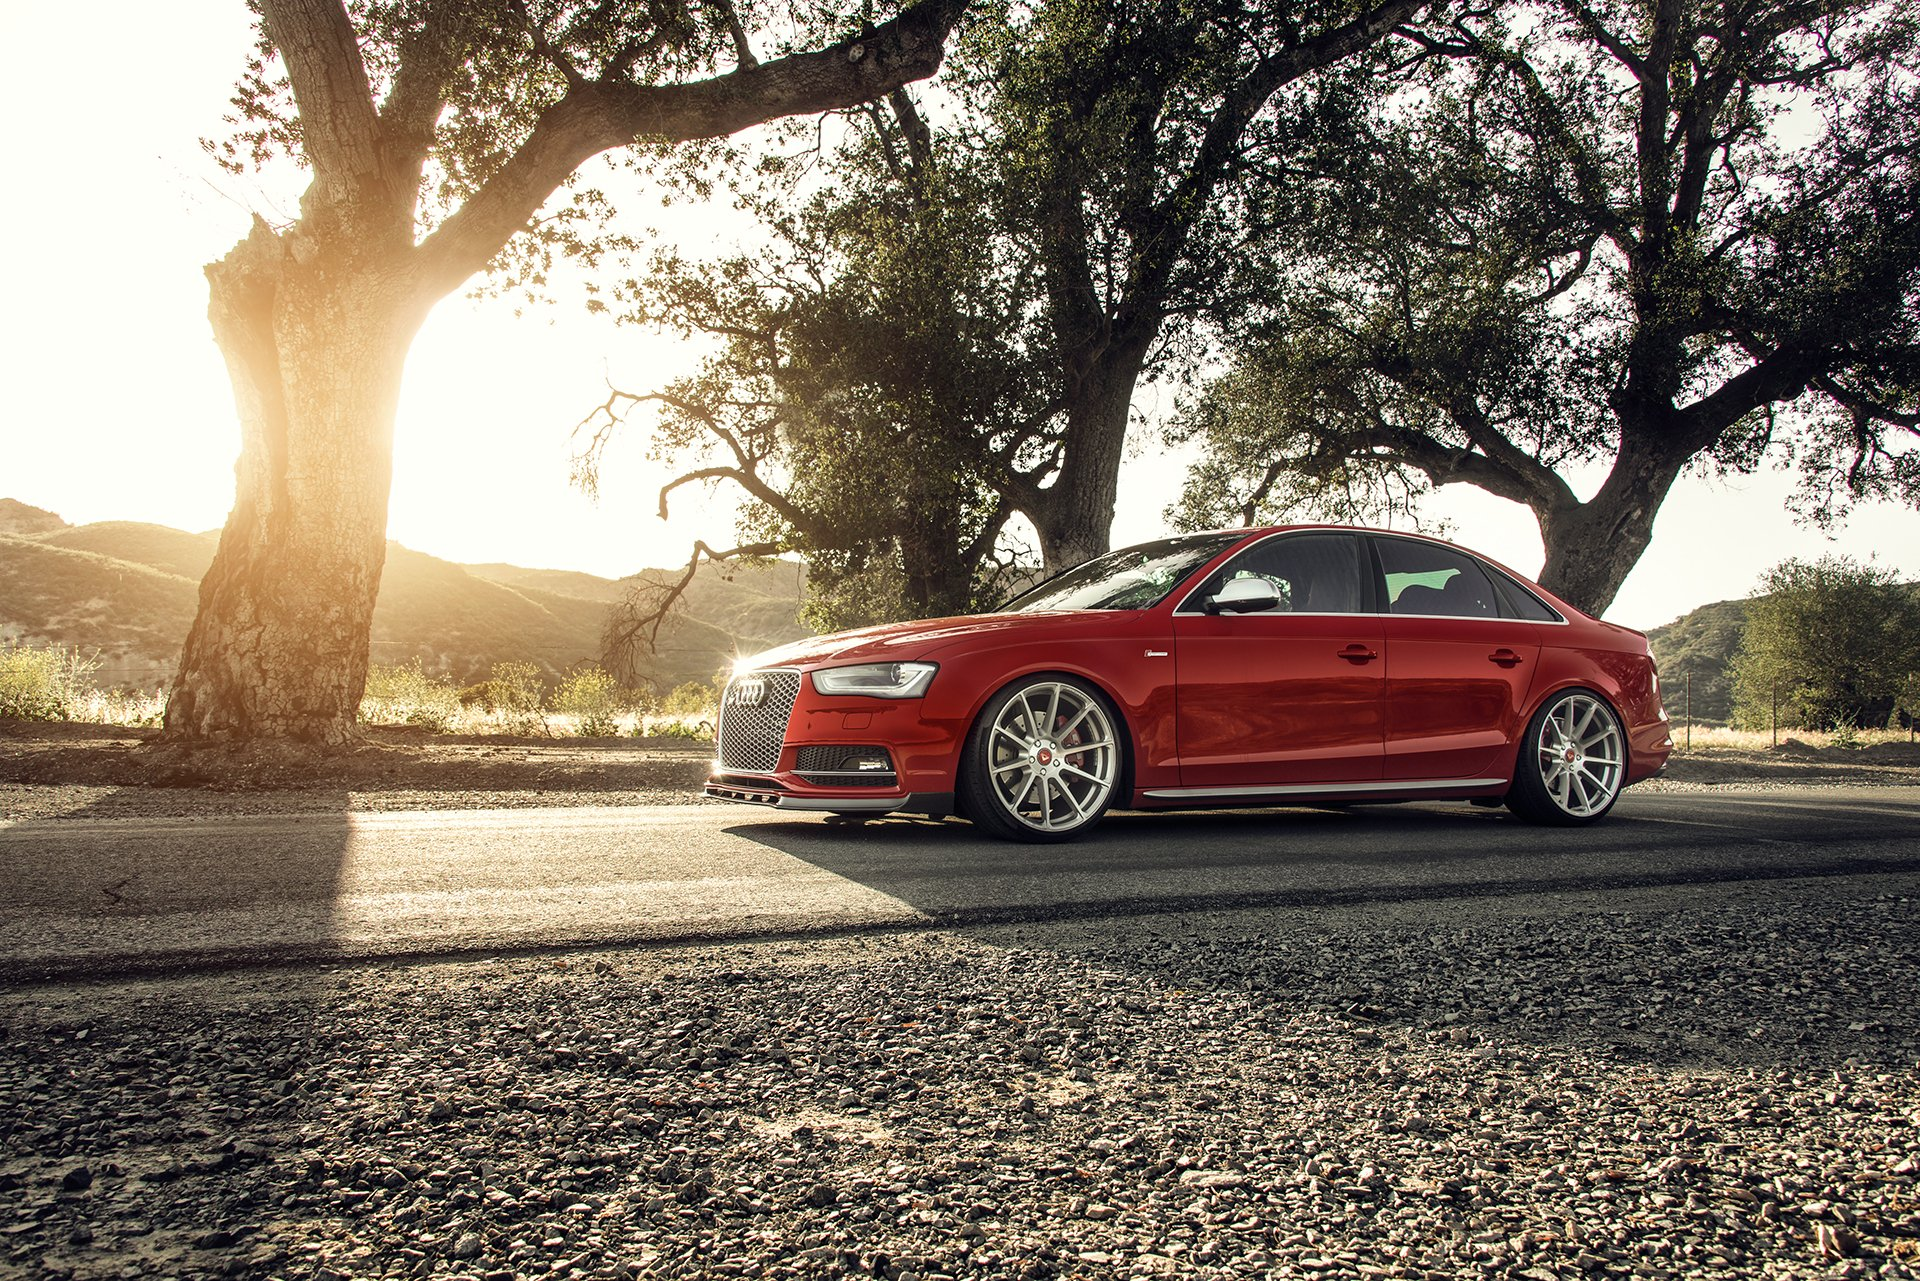 Audi S4 HD Wallpaper